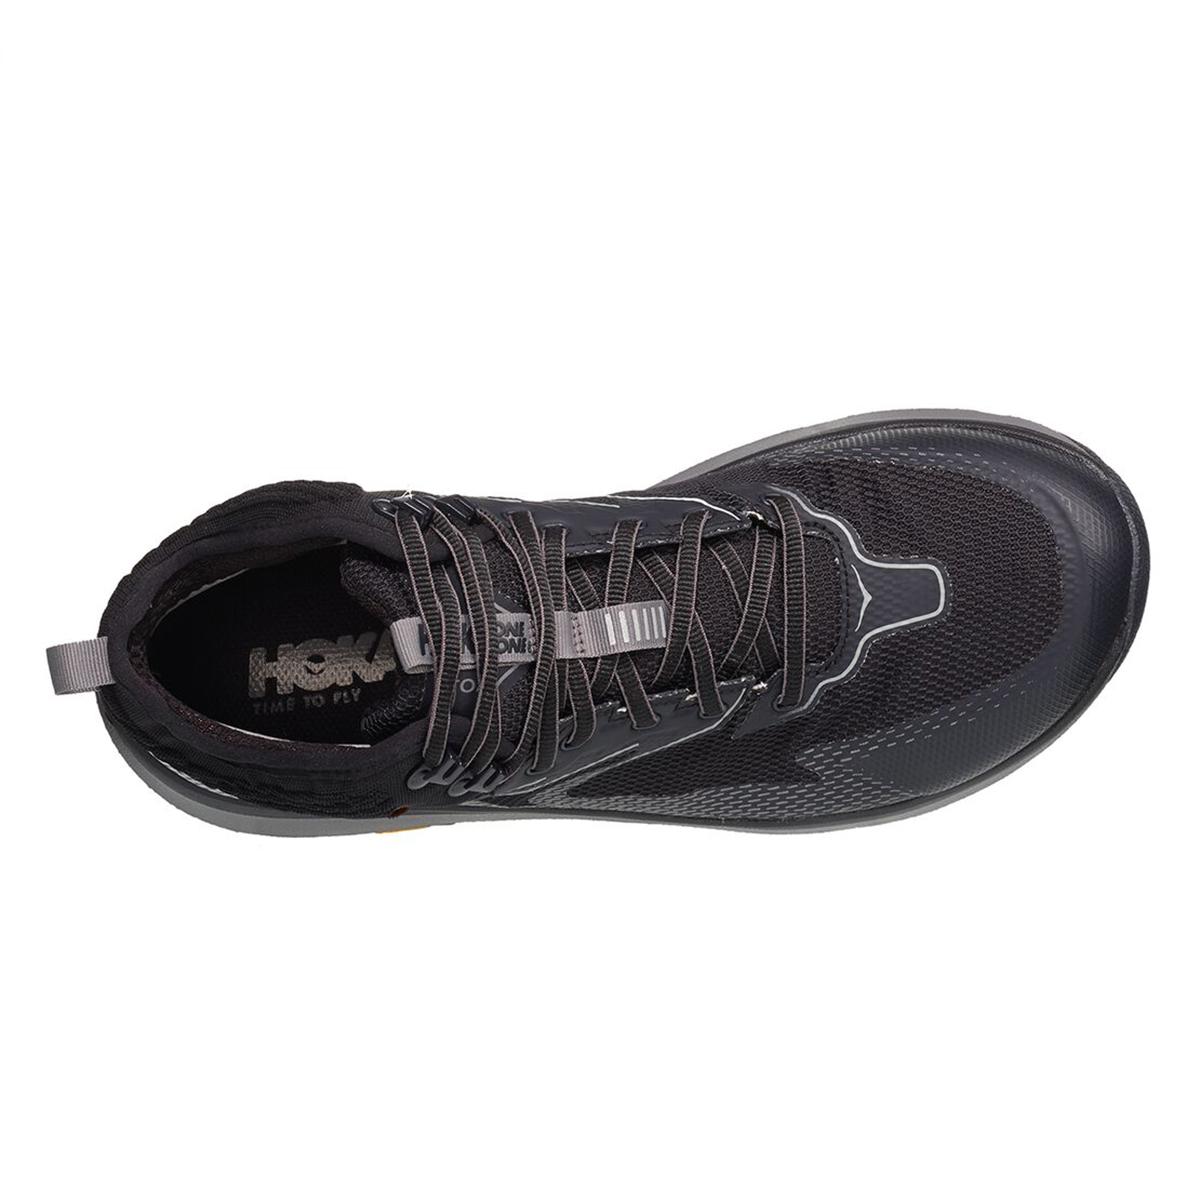 Men's Hoka One One Sky Toa Gore-Tex Trail Running Shoe - Color: Phantom - Size: 7 - Width: Regular, Phantom, large, image 3